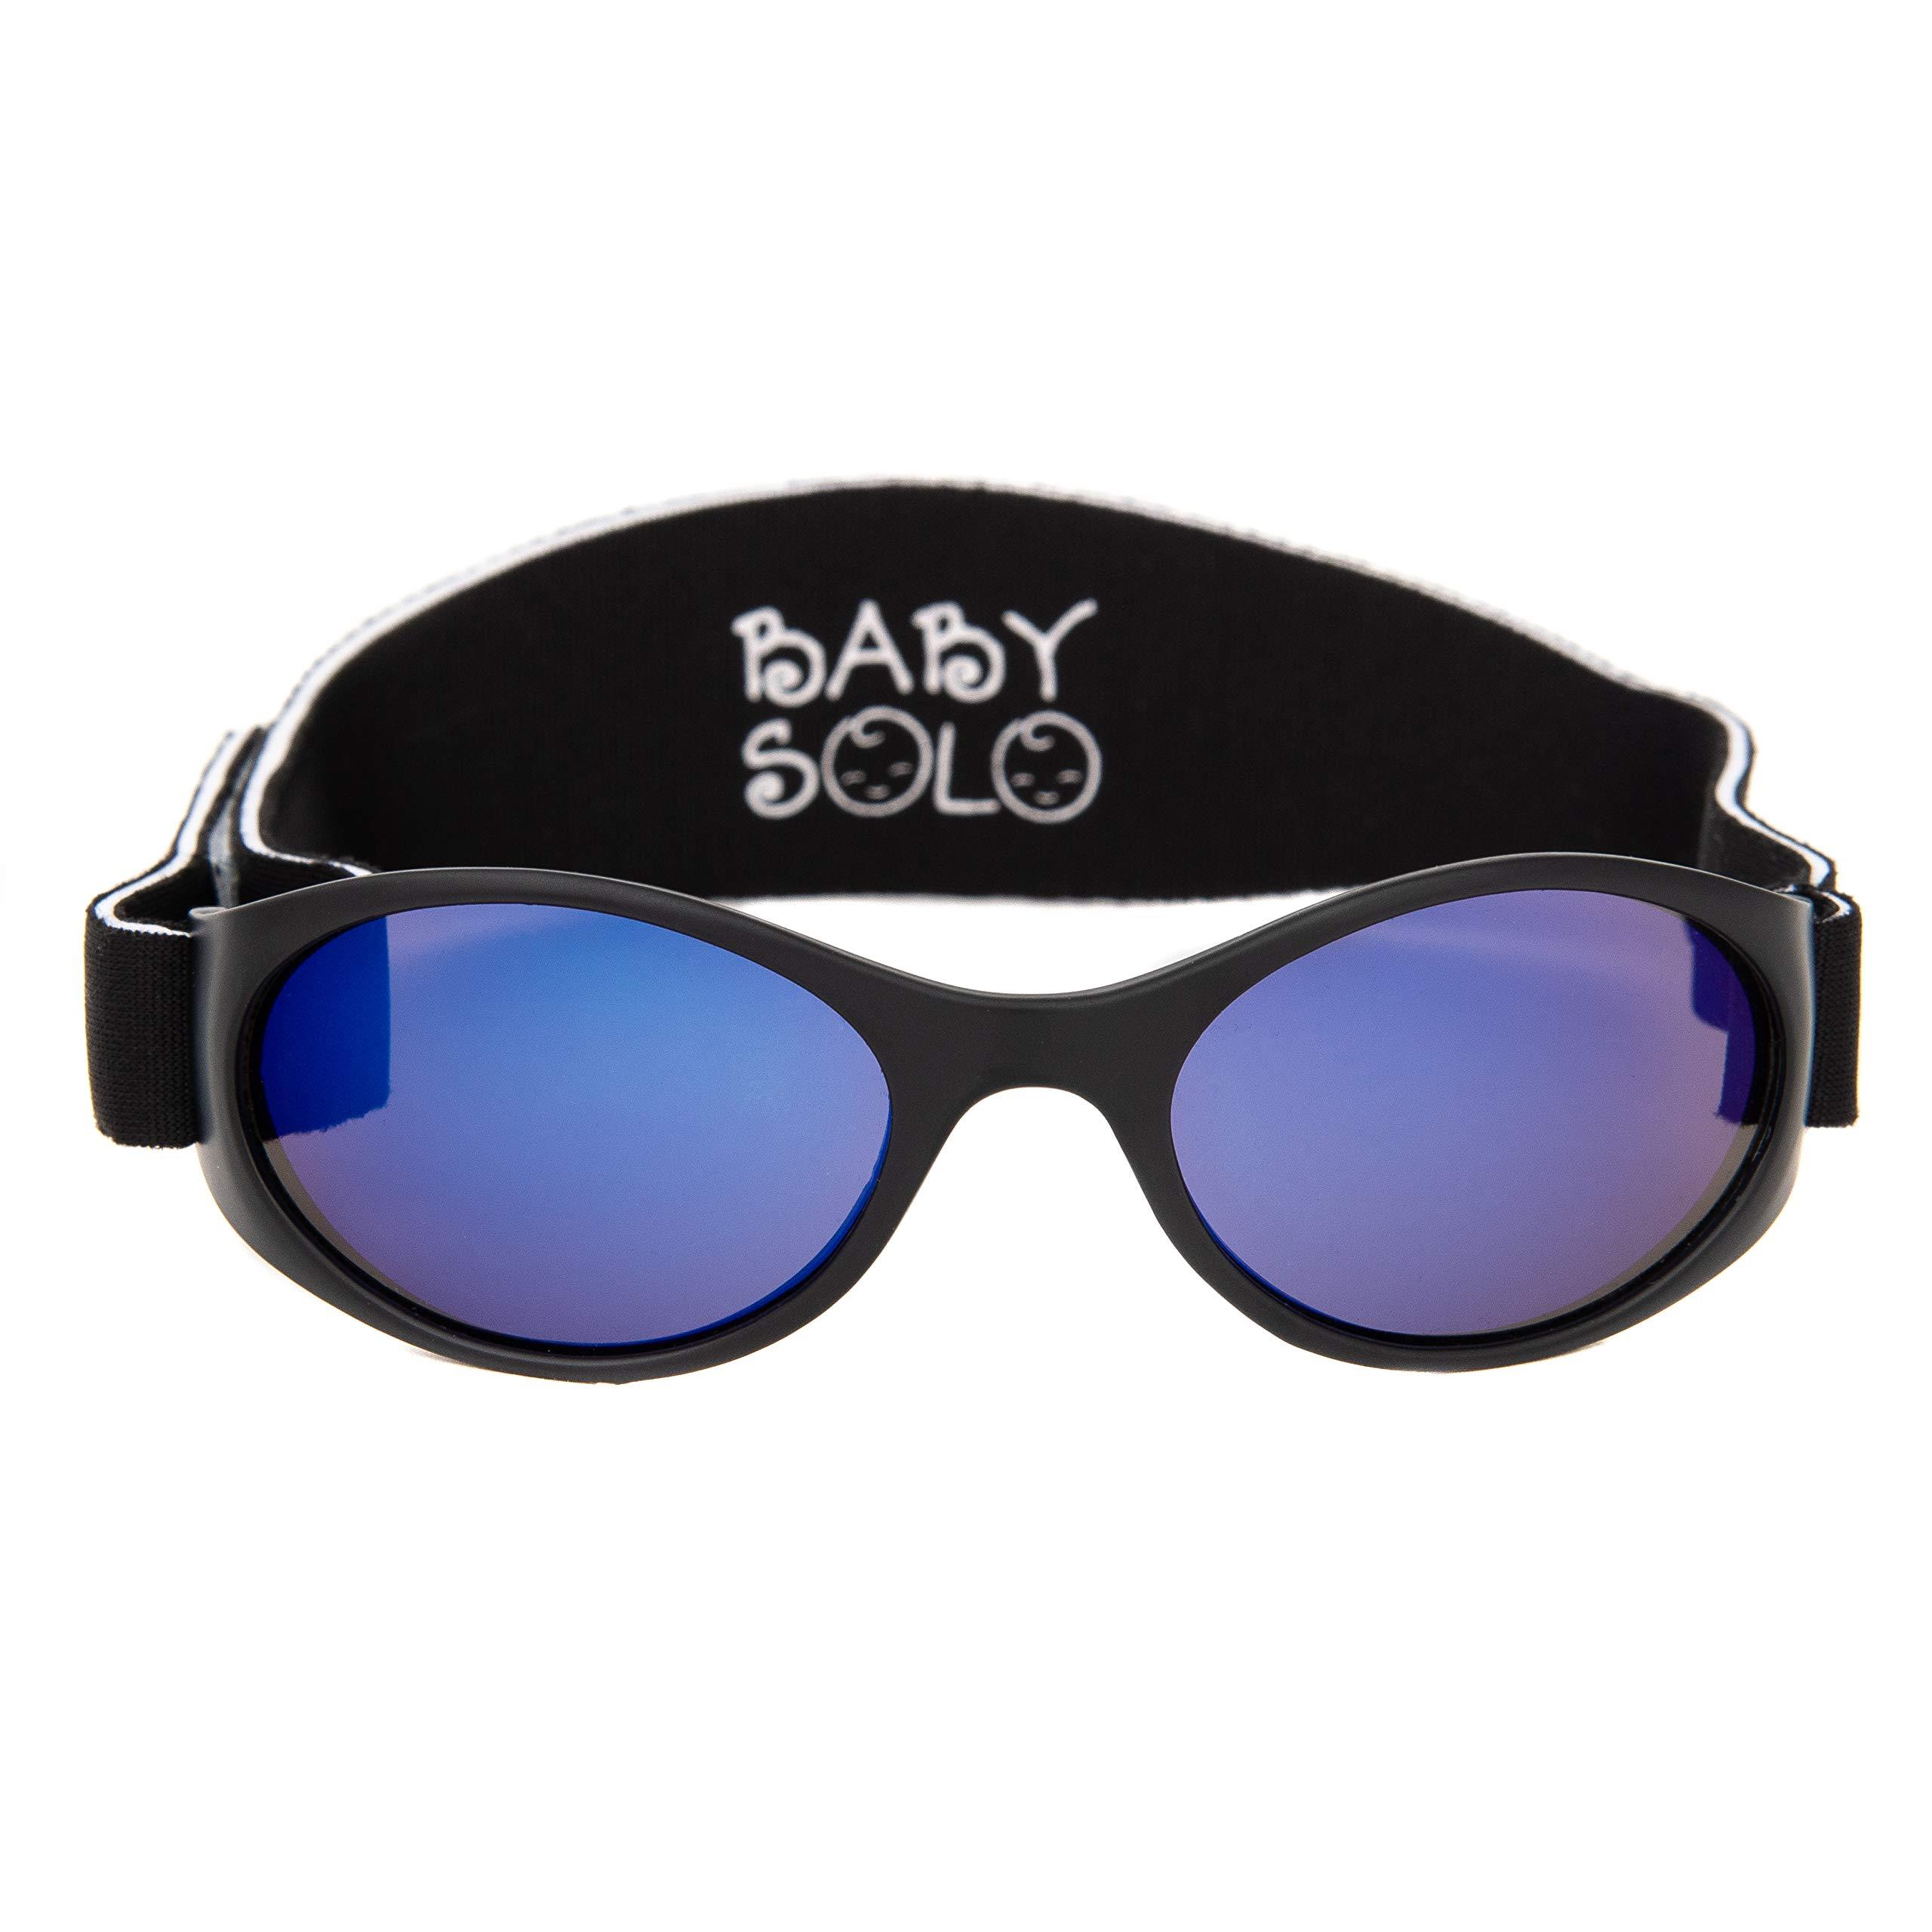 Baby Solo Original Baby Sunglasses Safe, Soft, Adorable Durable Case Included (0-36 Months, Matte Black Frame w/Blue Mirror Lens)